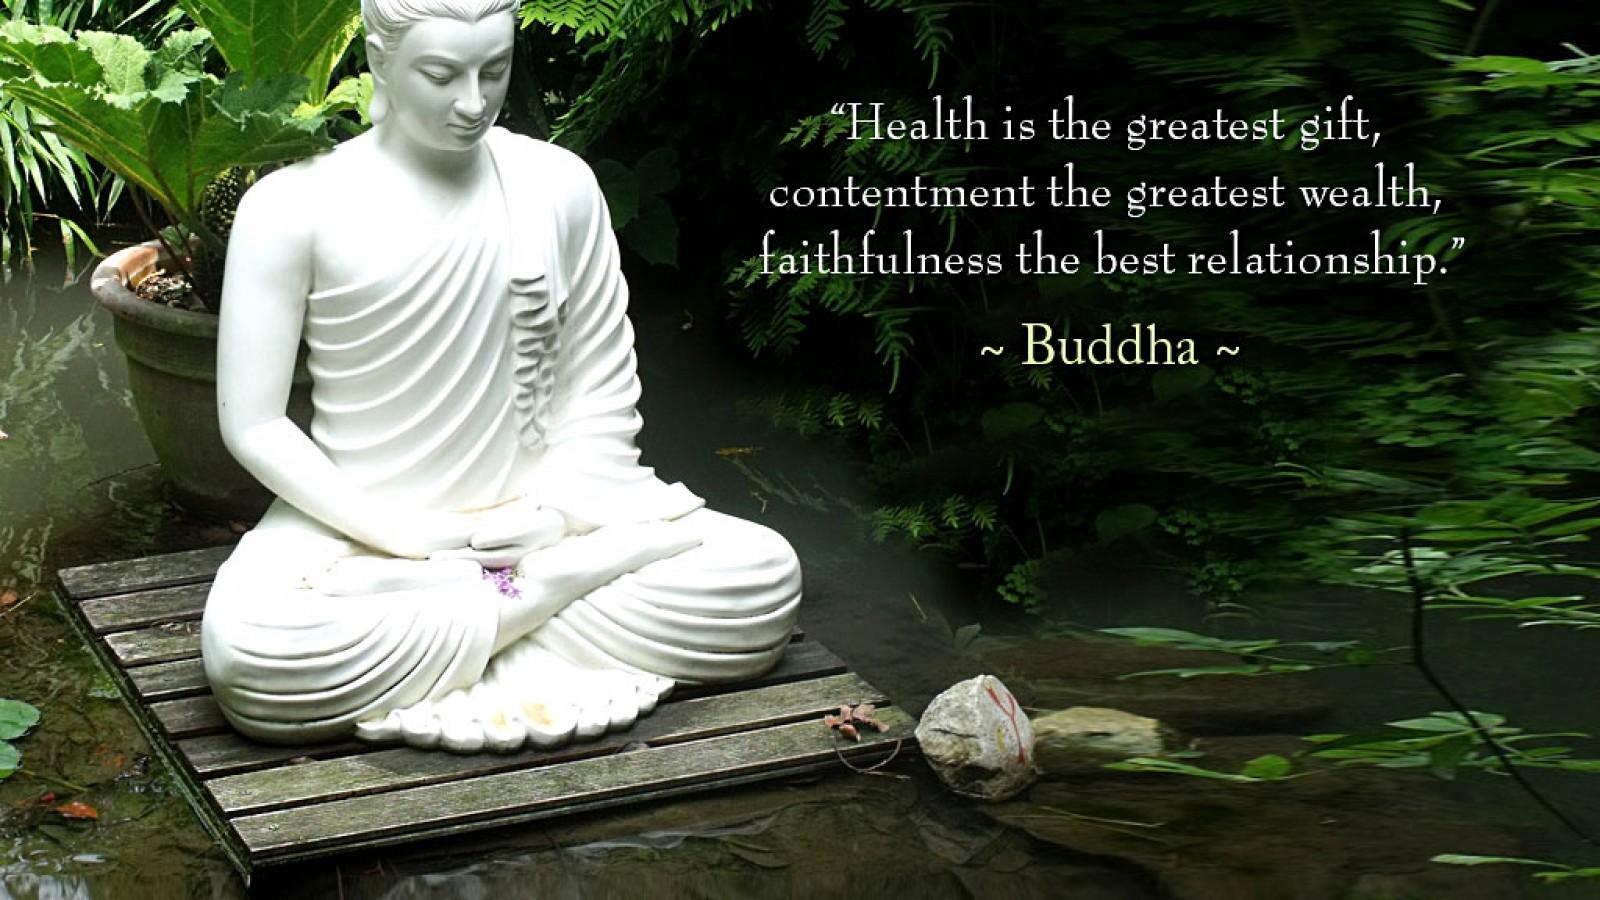 Buddha Quotes On Health